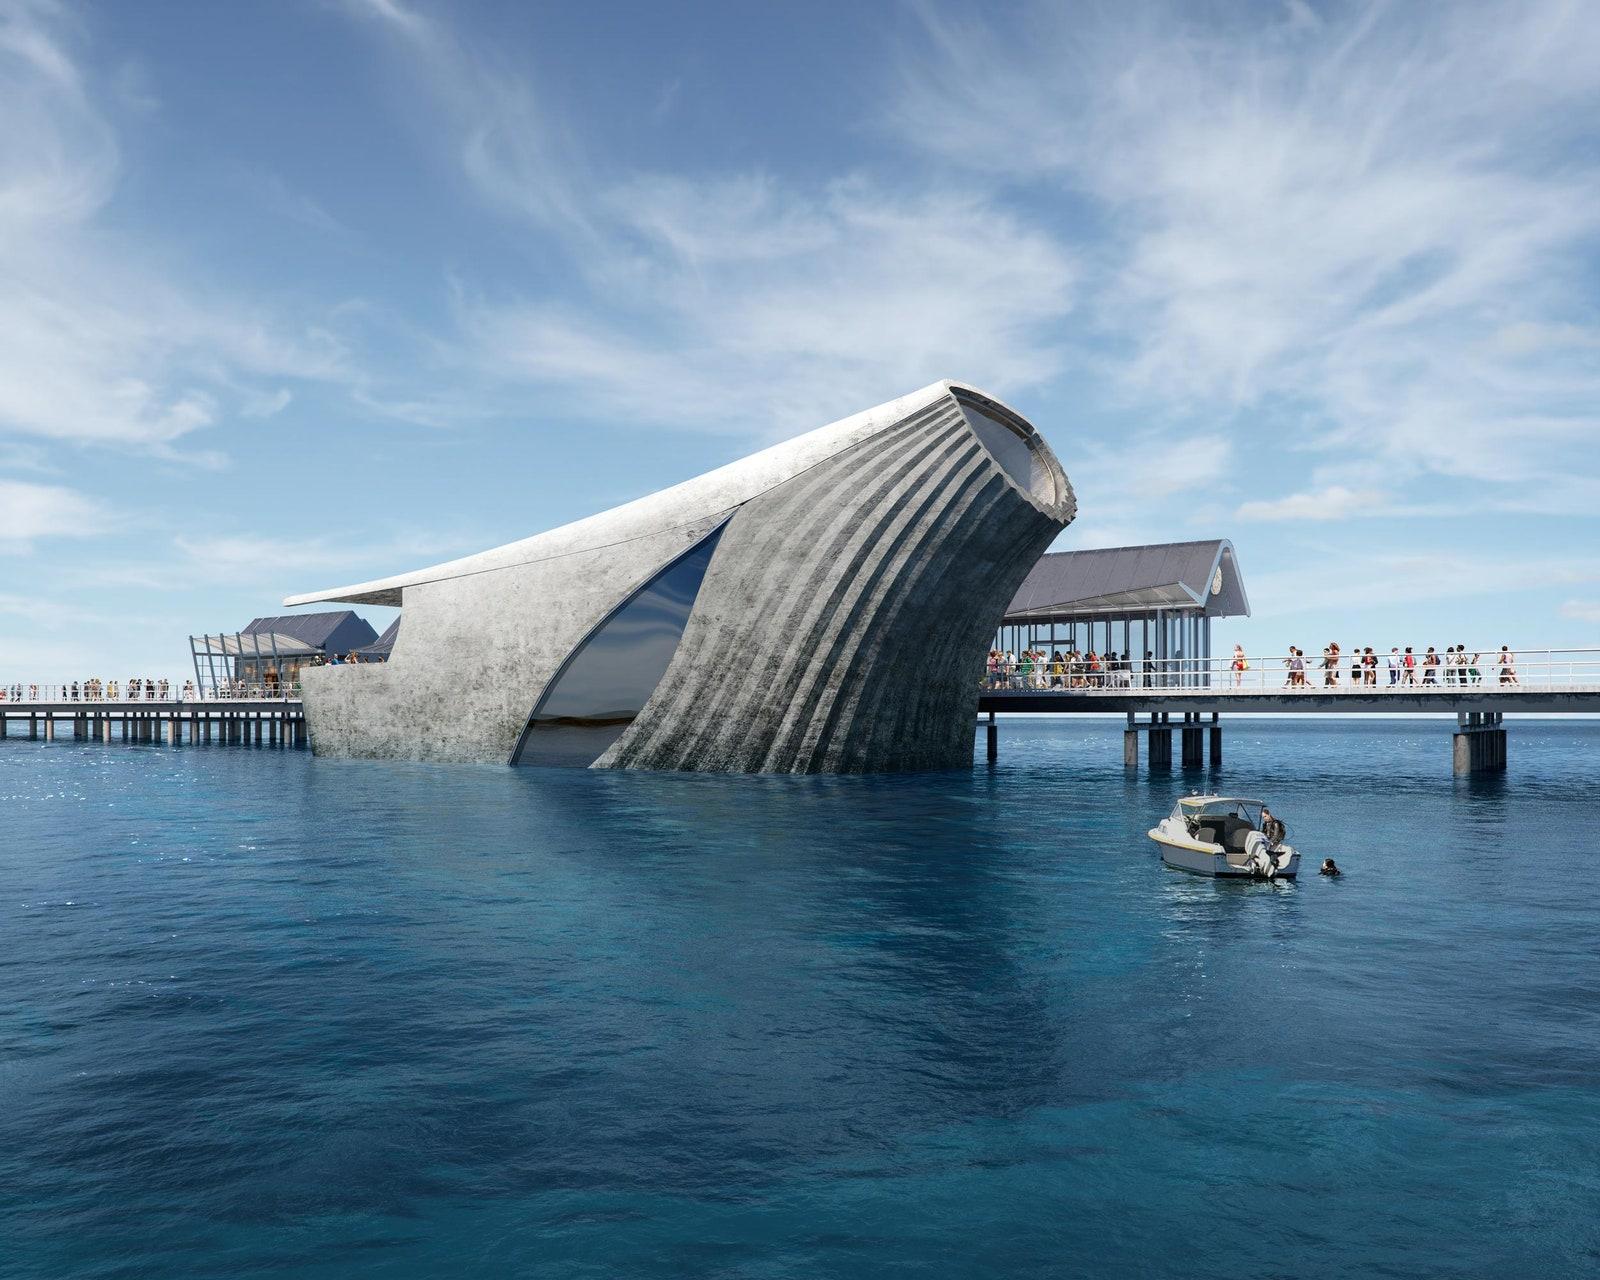 Australia will run a natural marine laboratory with amazing architecture